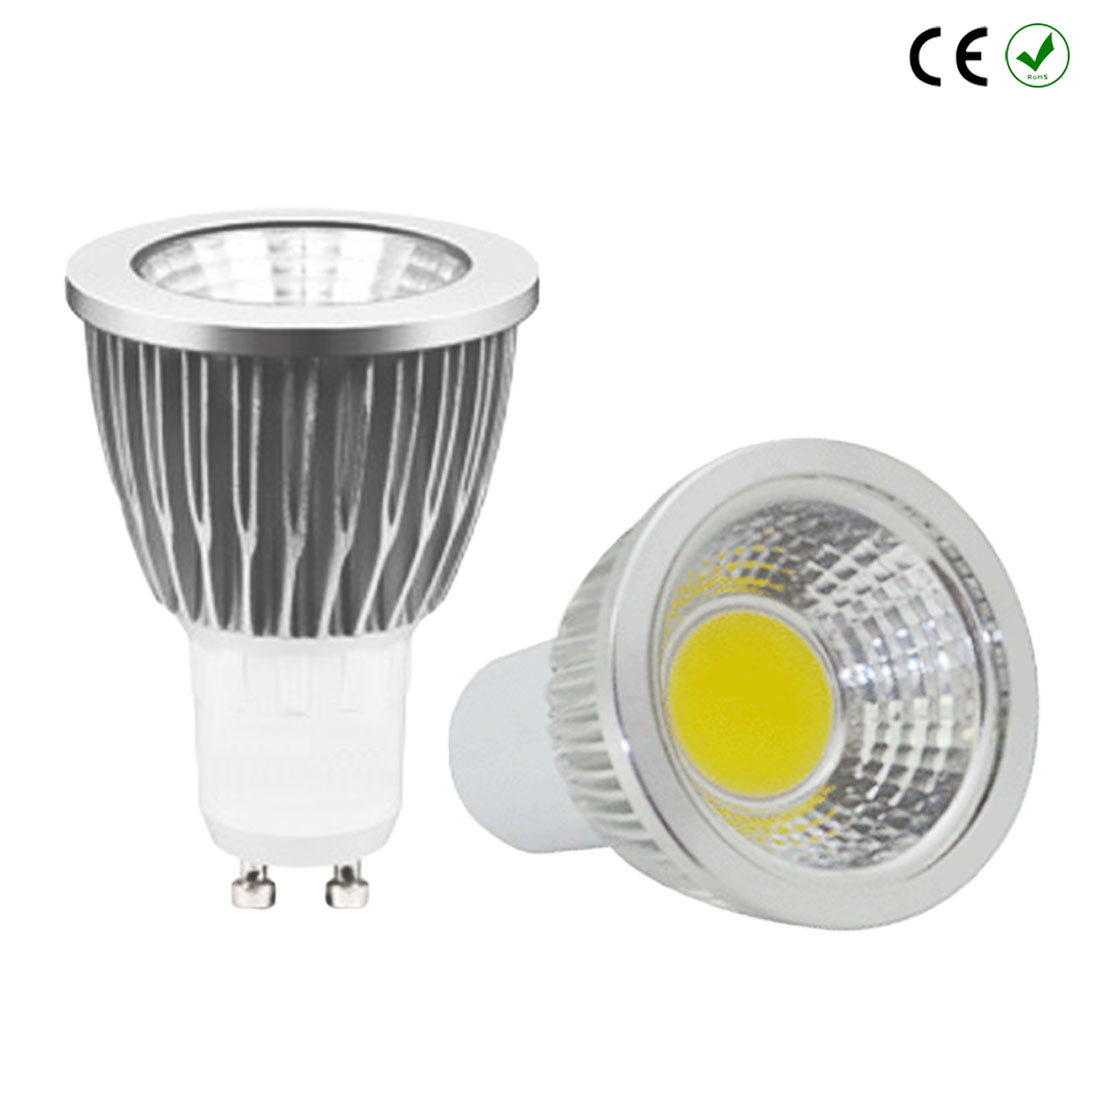 3W 5W 7W Spot Light LED Bulb Led 85V-265V 12V GU10 E27 COB MR16 2700K 3000K Warm White bulb replace energy saving lamp